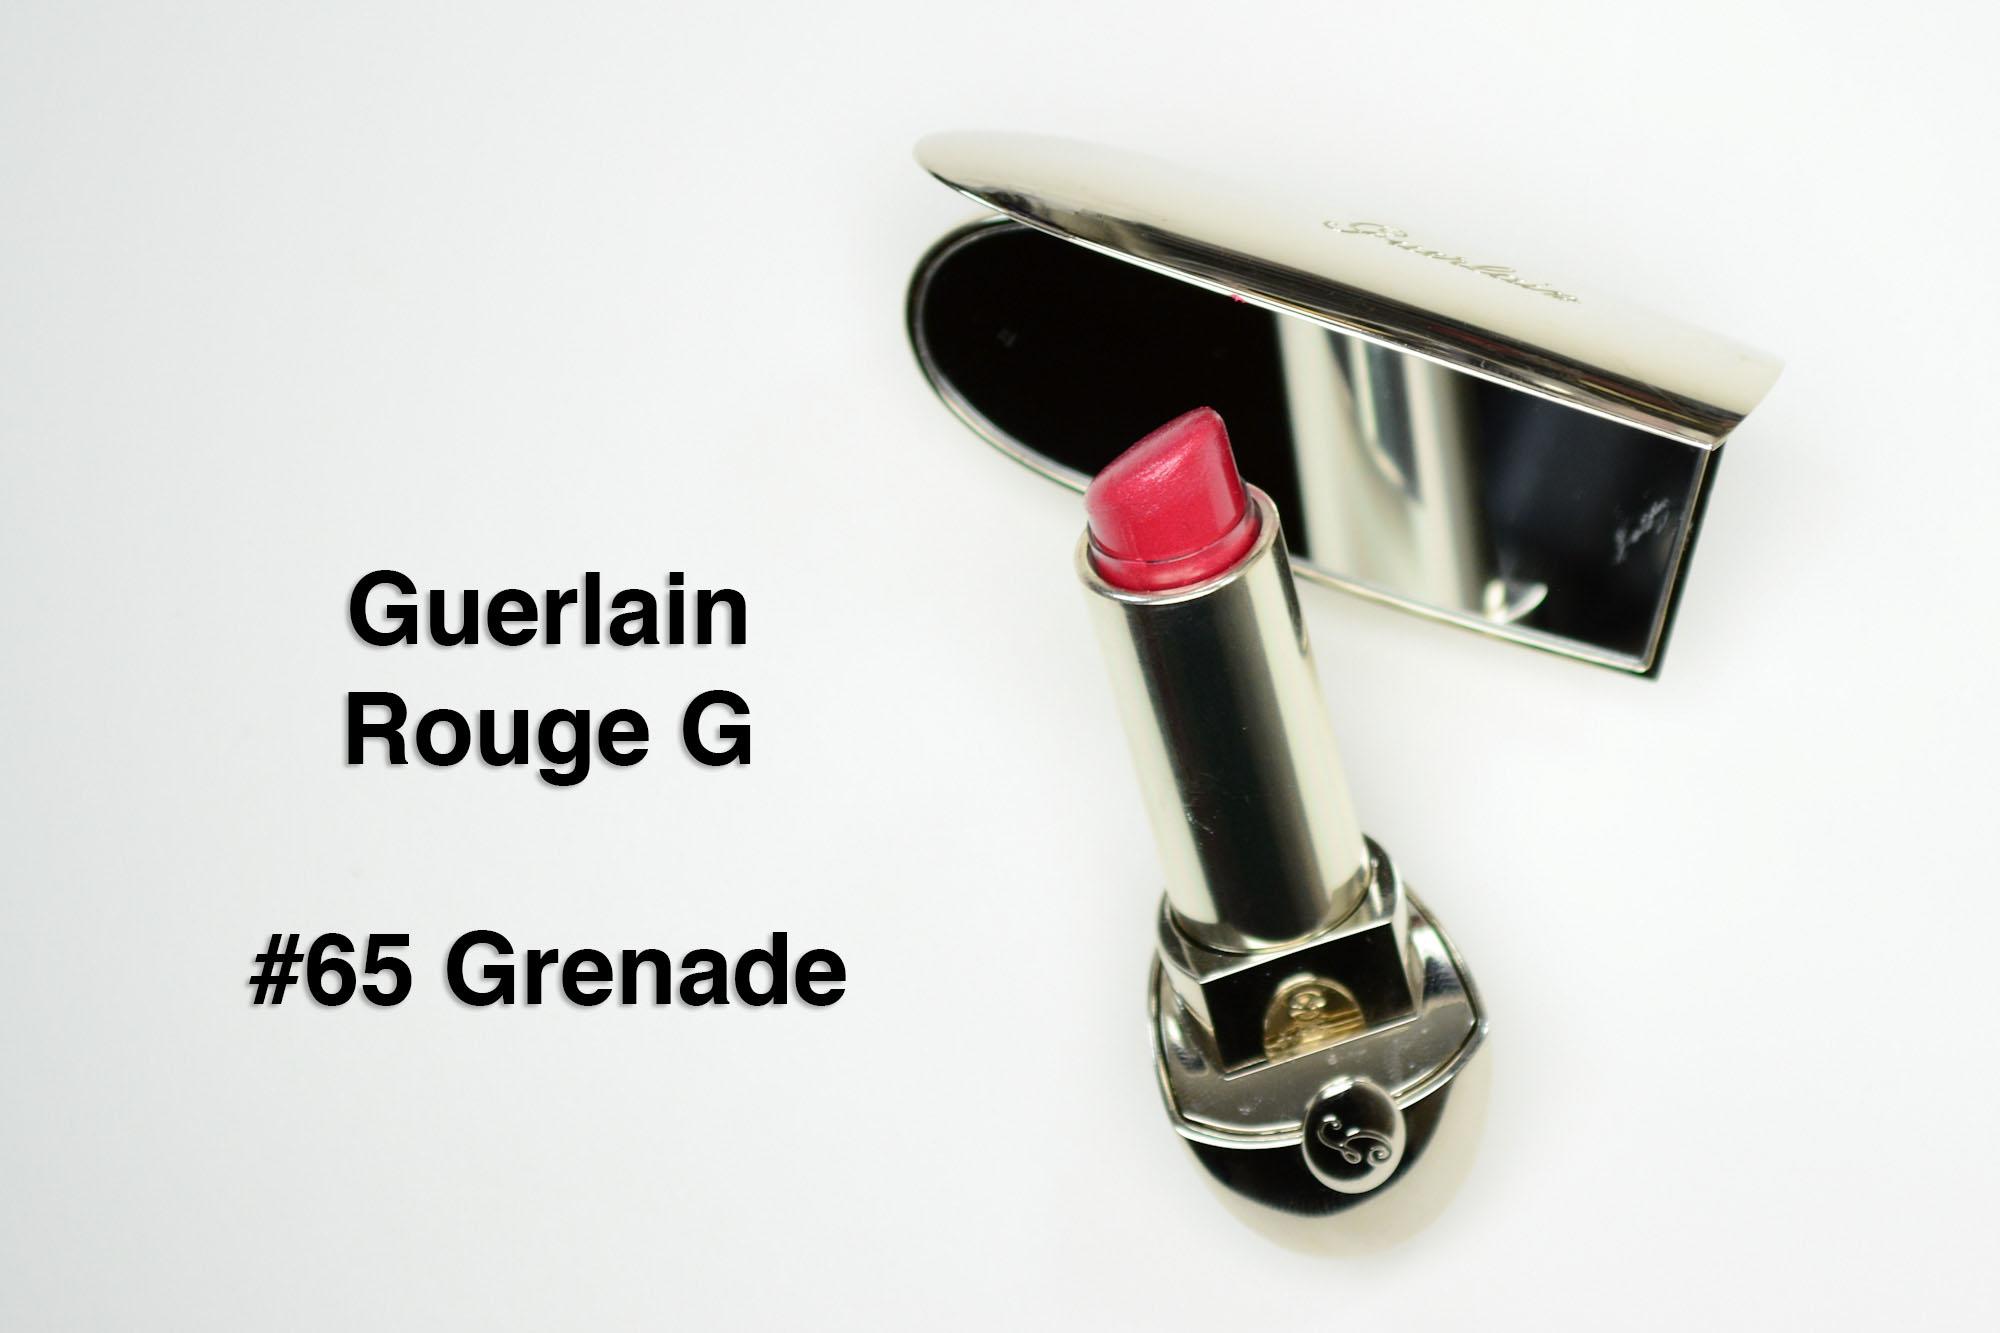 Review: Guerlain Rouge G in Grenade